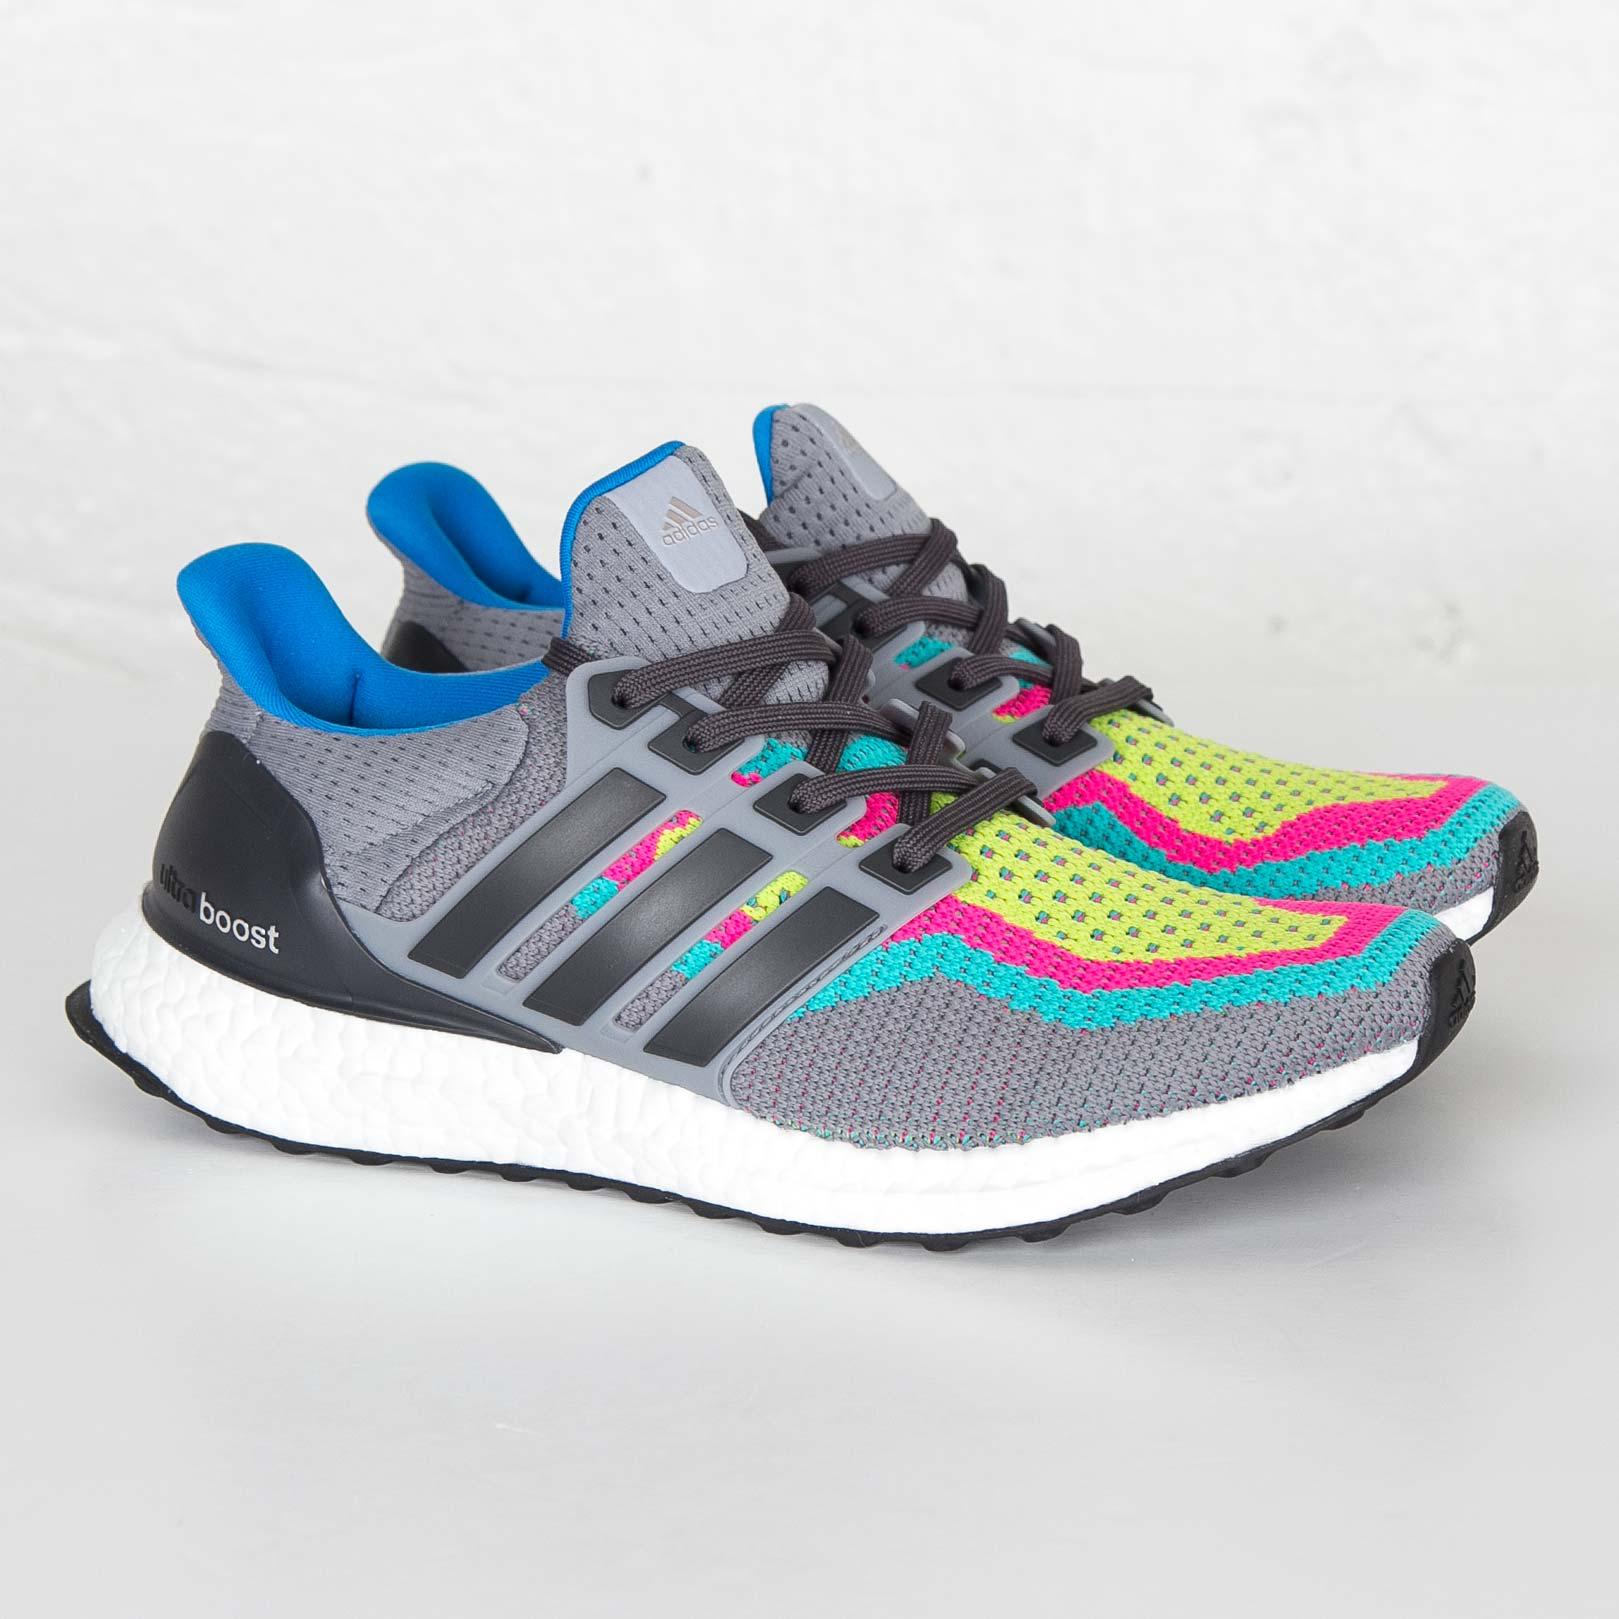 new arrival e4a74 b951c adidas ultra boost m